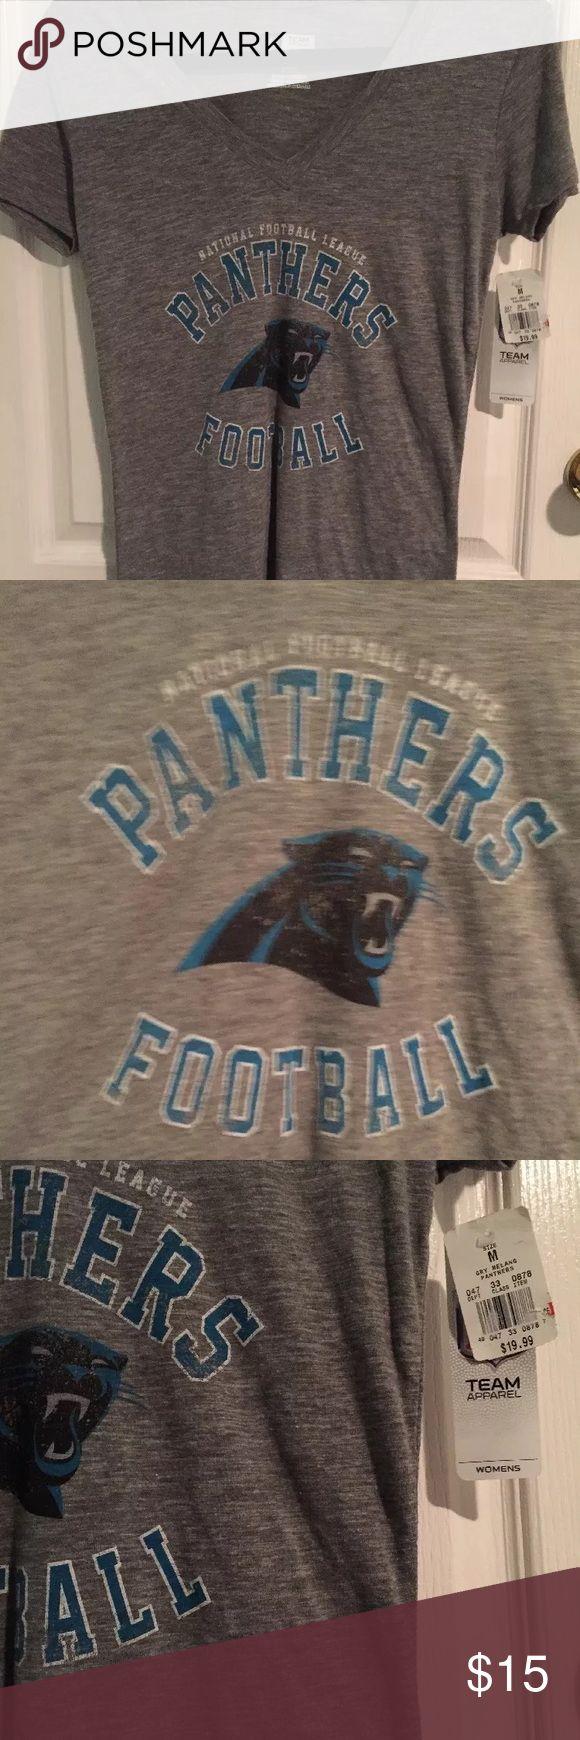 NWT Carolina Panthers Grey VNeck size medium NWT Carolina panthers NFL vneck grey. NFL Apparel Tops Tees - Short Sleeve